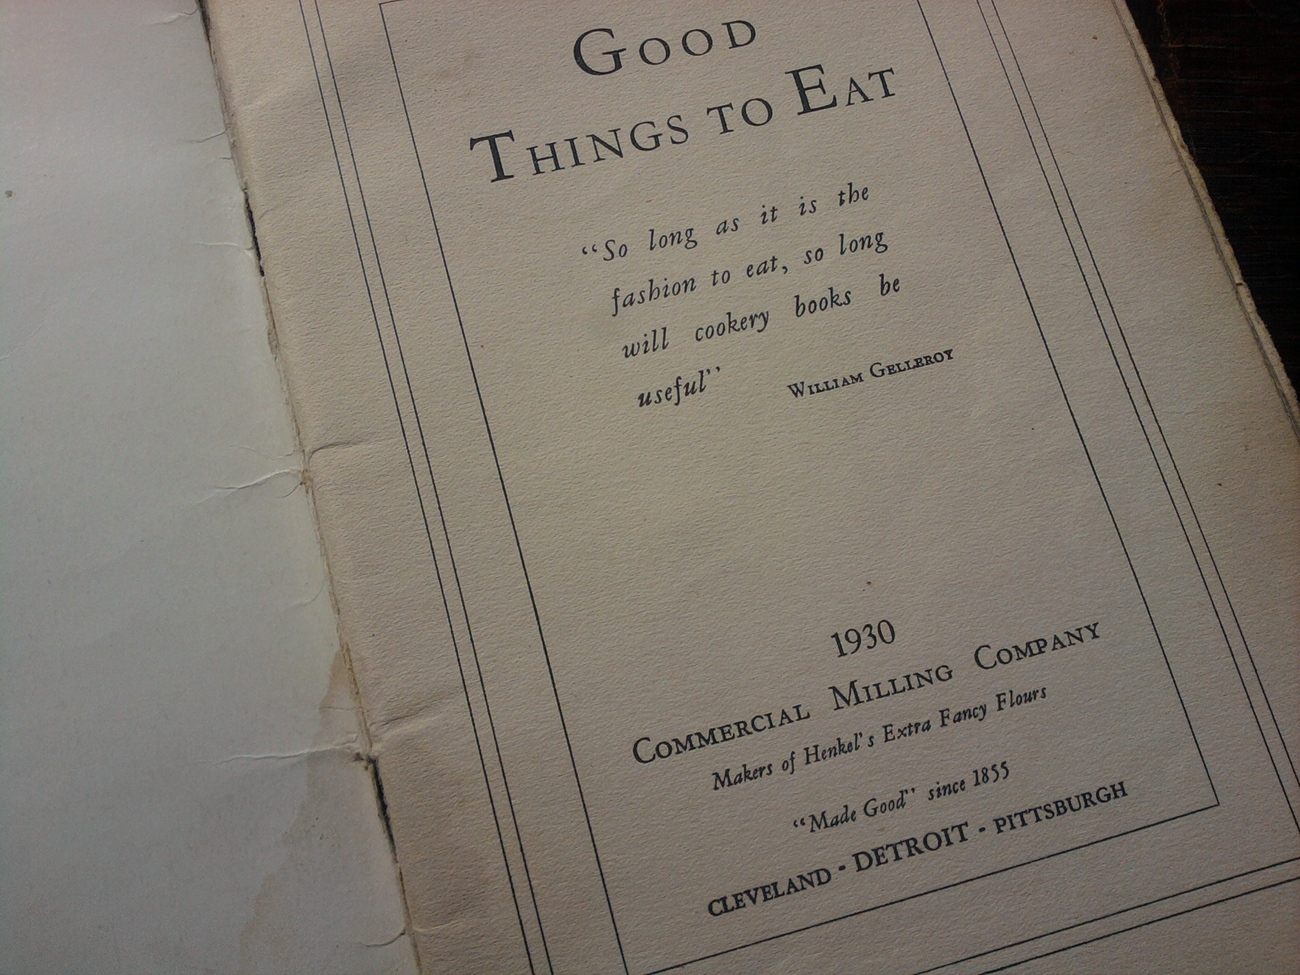 COOK BOOK - 1933 HENKEL'S FLOURS - GOOD THINGS TO EAT